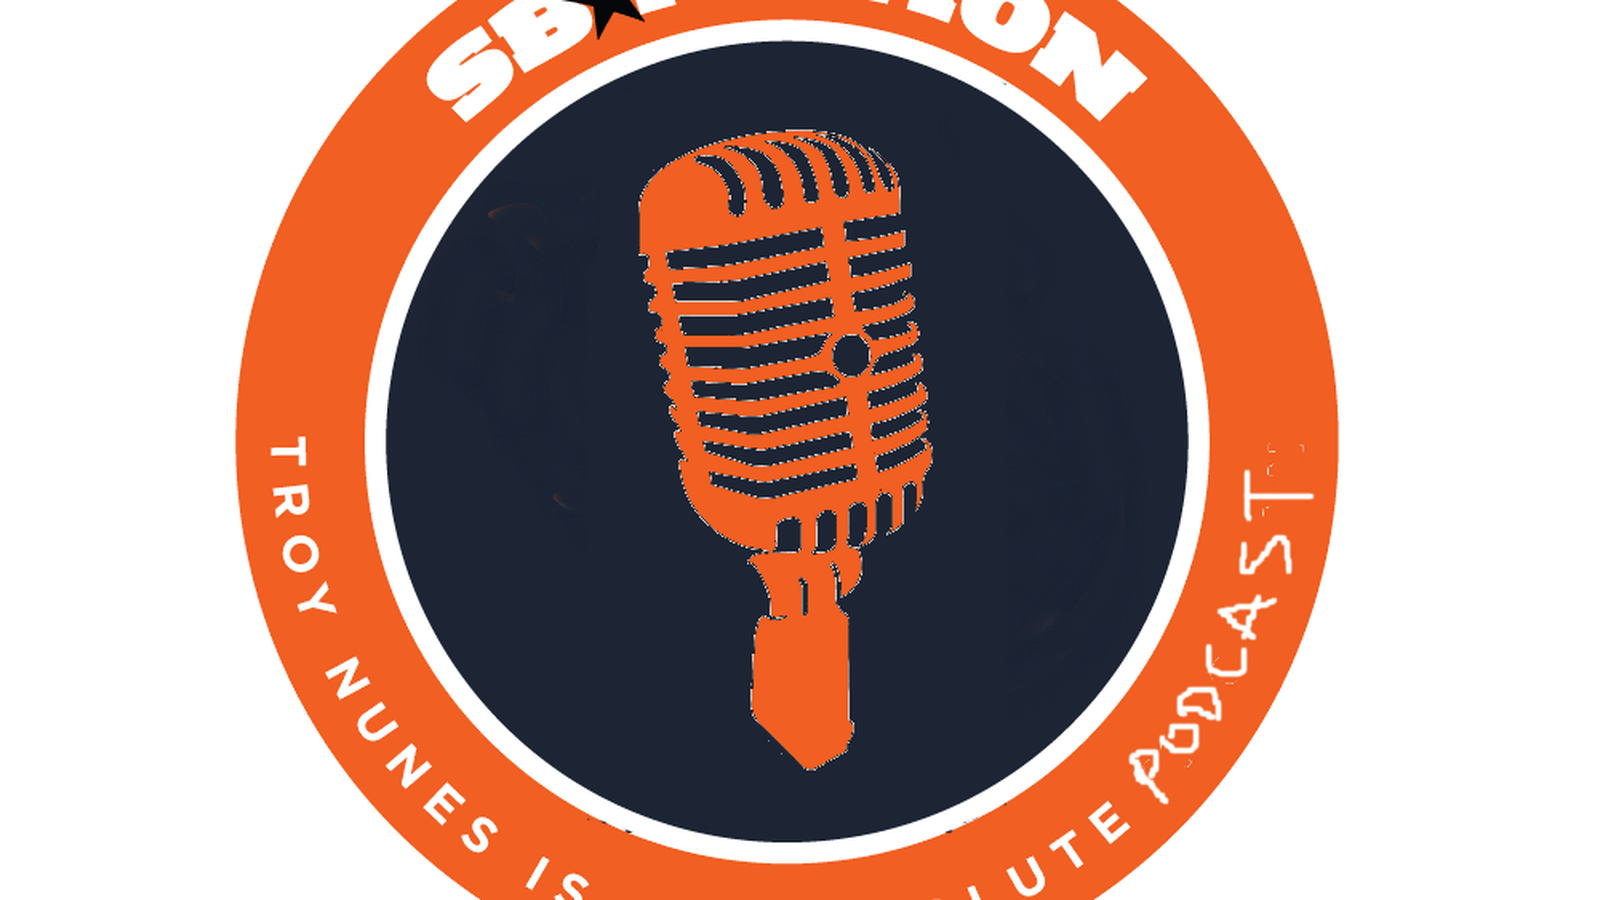 Nunesmagician_podcast.0.0